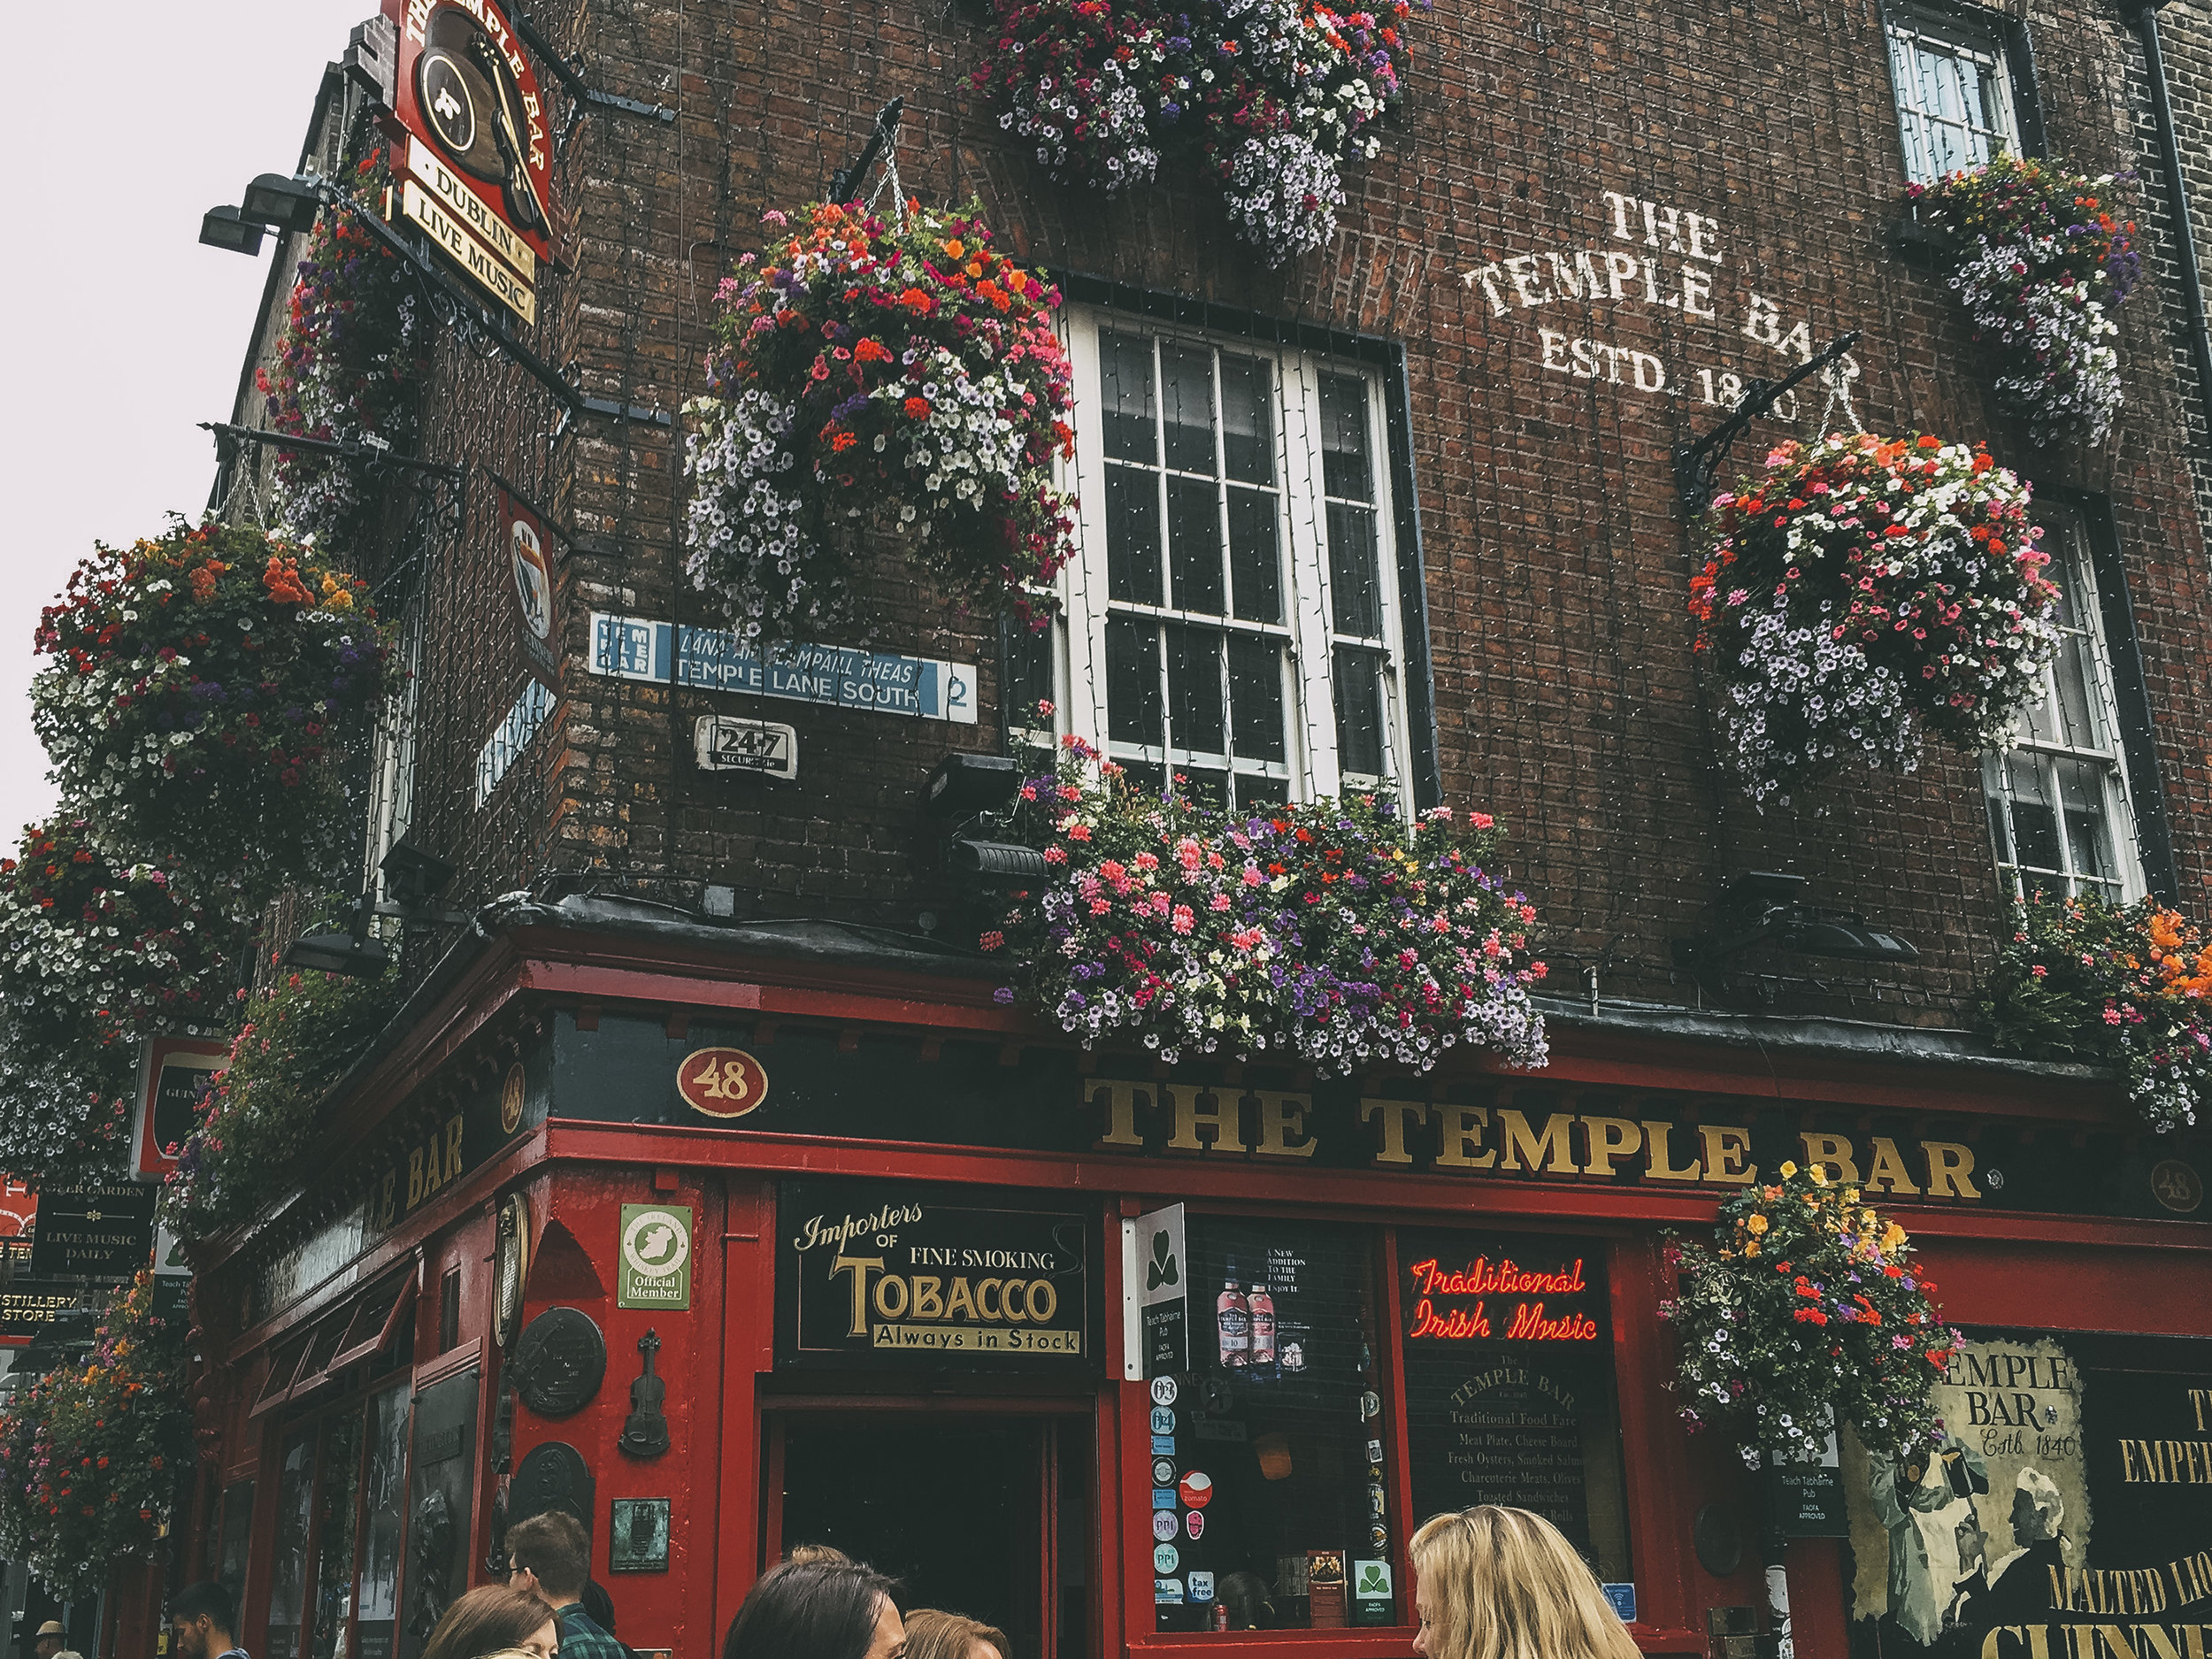 Dublin_07272016_46_1.jpg